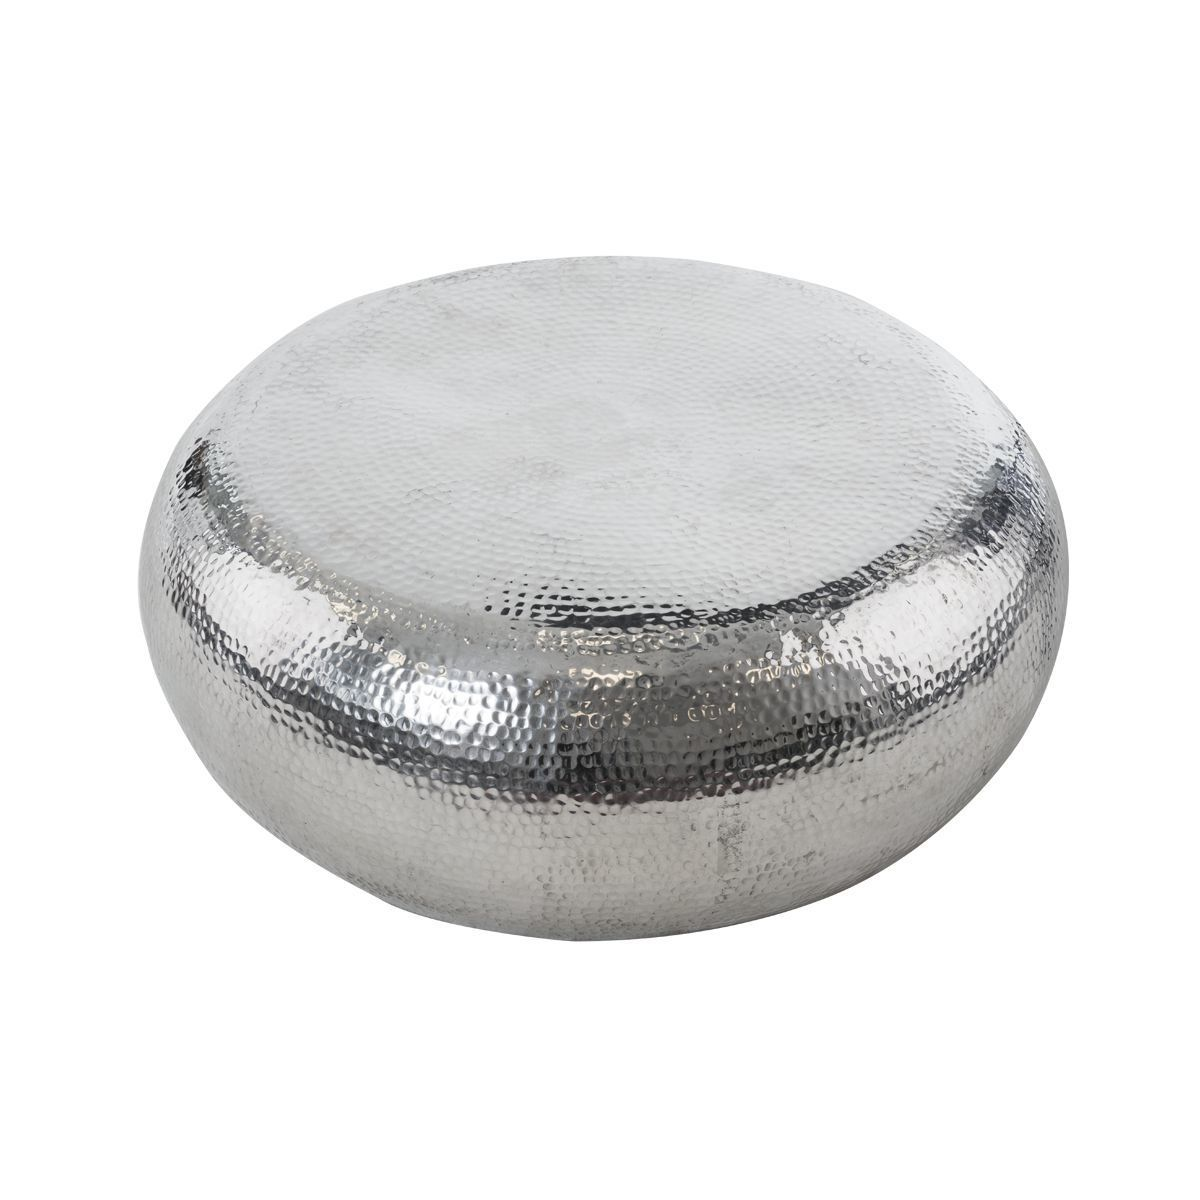 Couchtisch Galaxy Vintage Look Aluminium Jetzt Bestellen